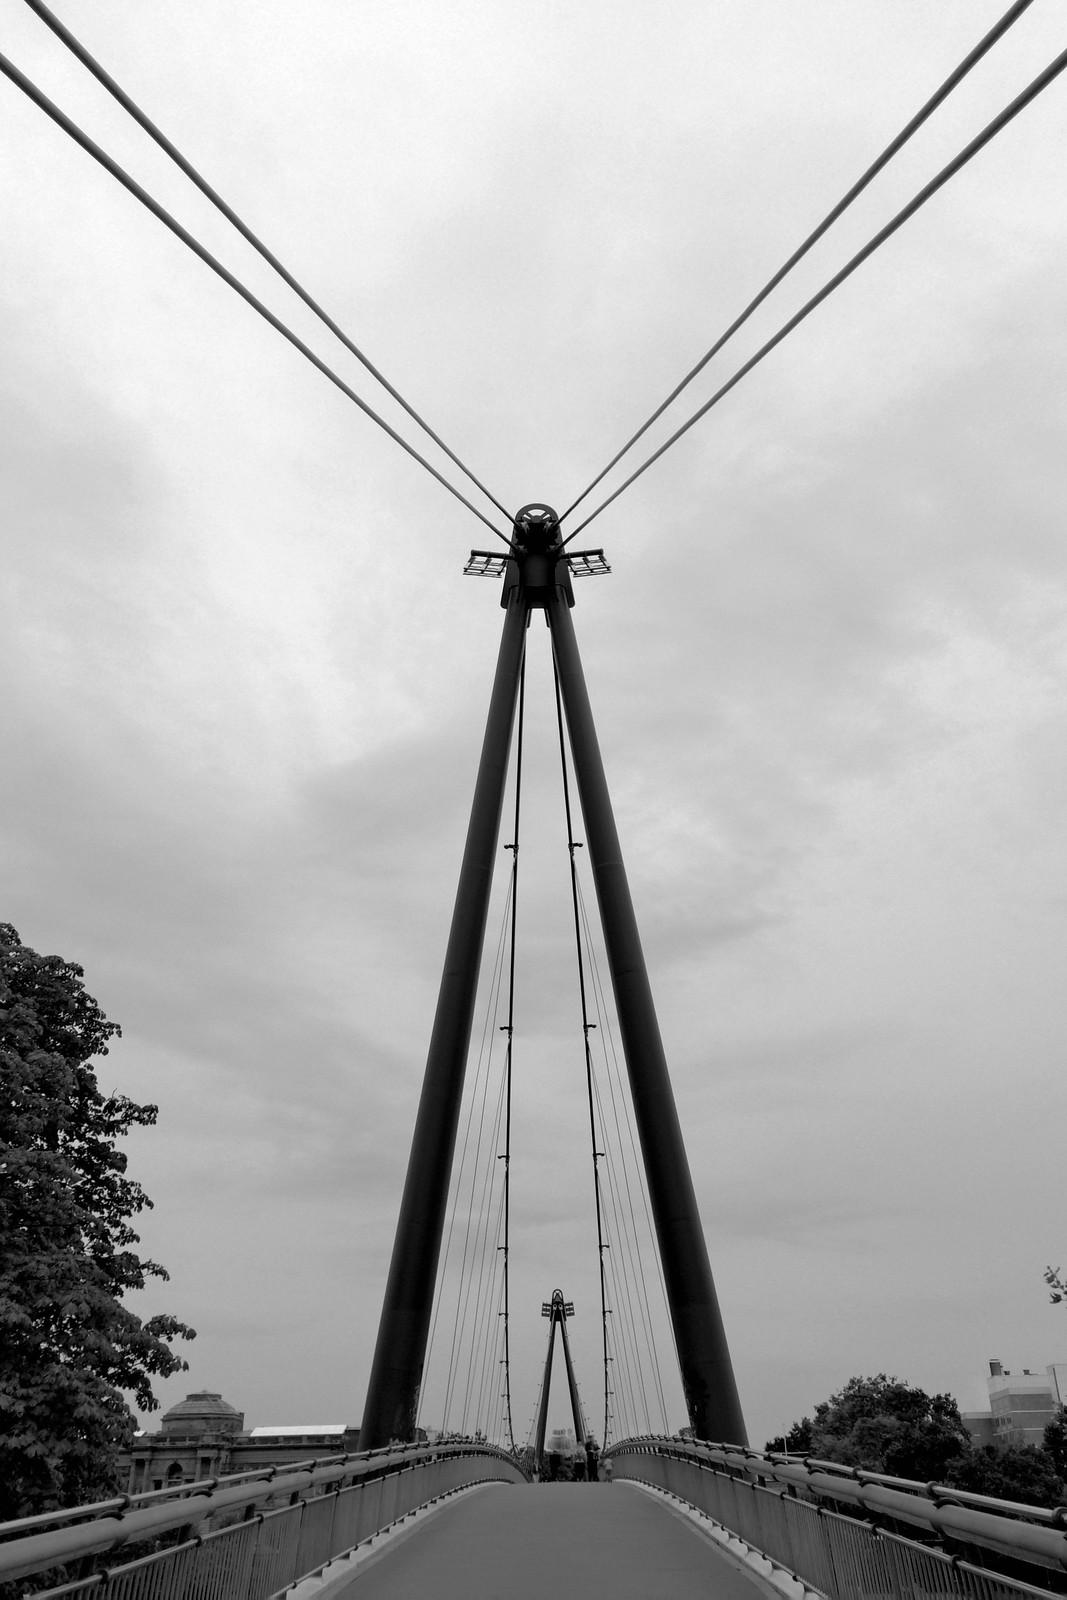 Suspension bridge in Frankfurt, Germany